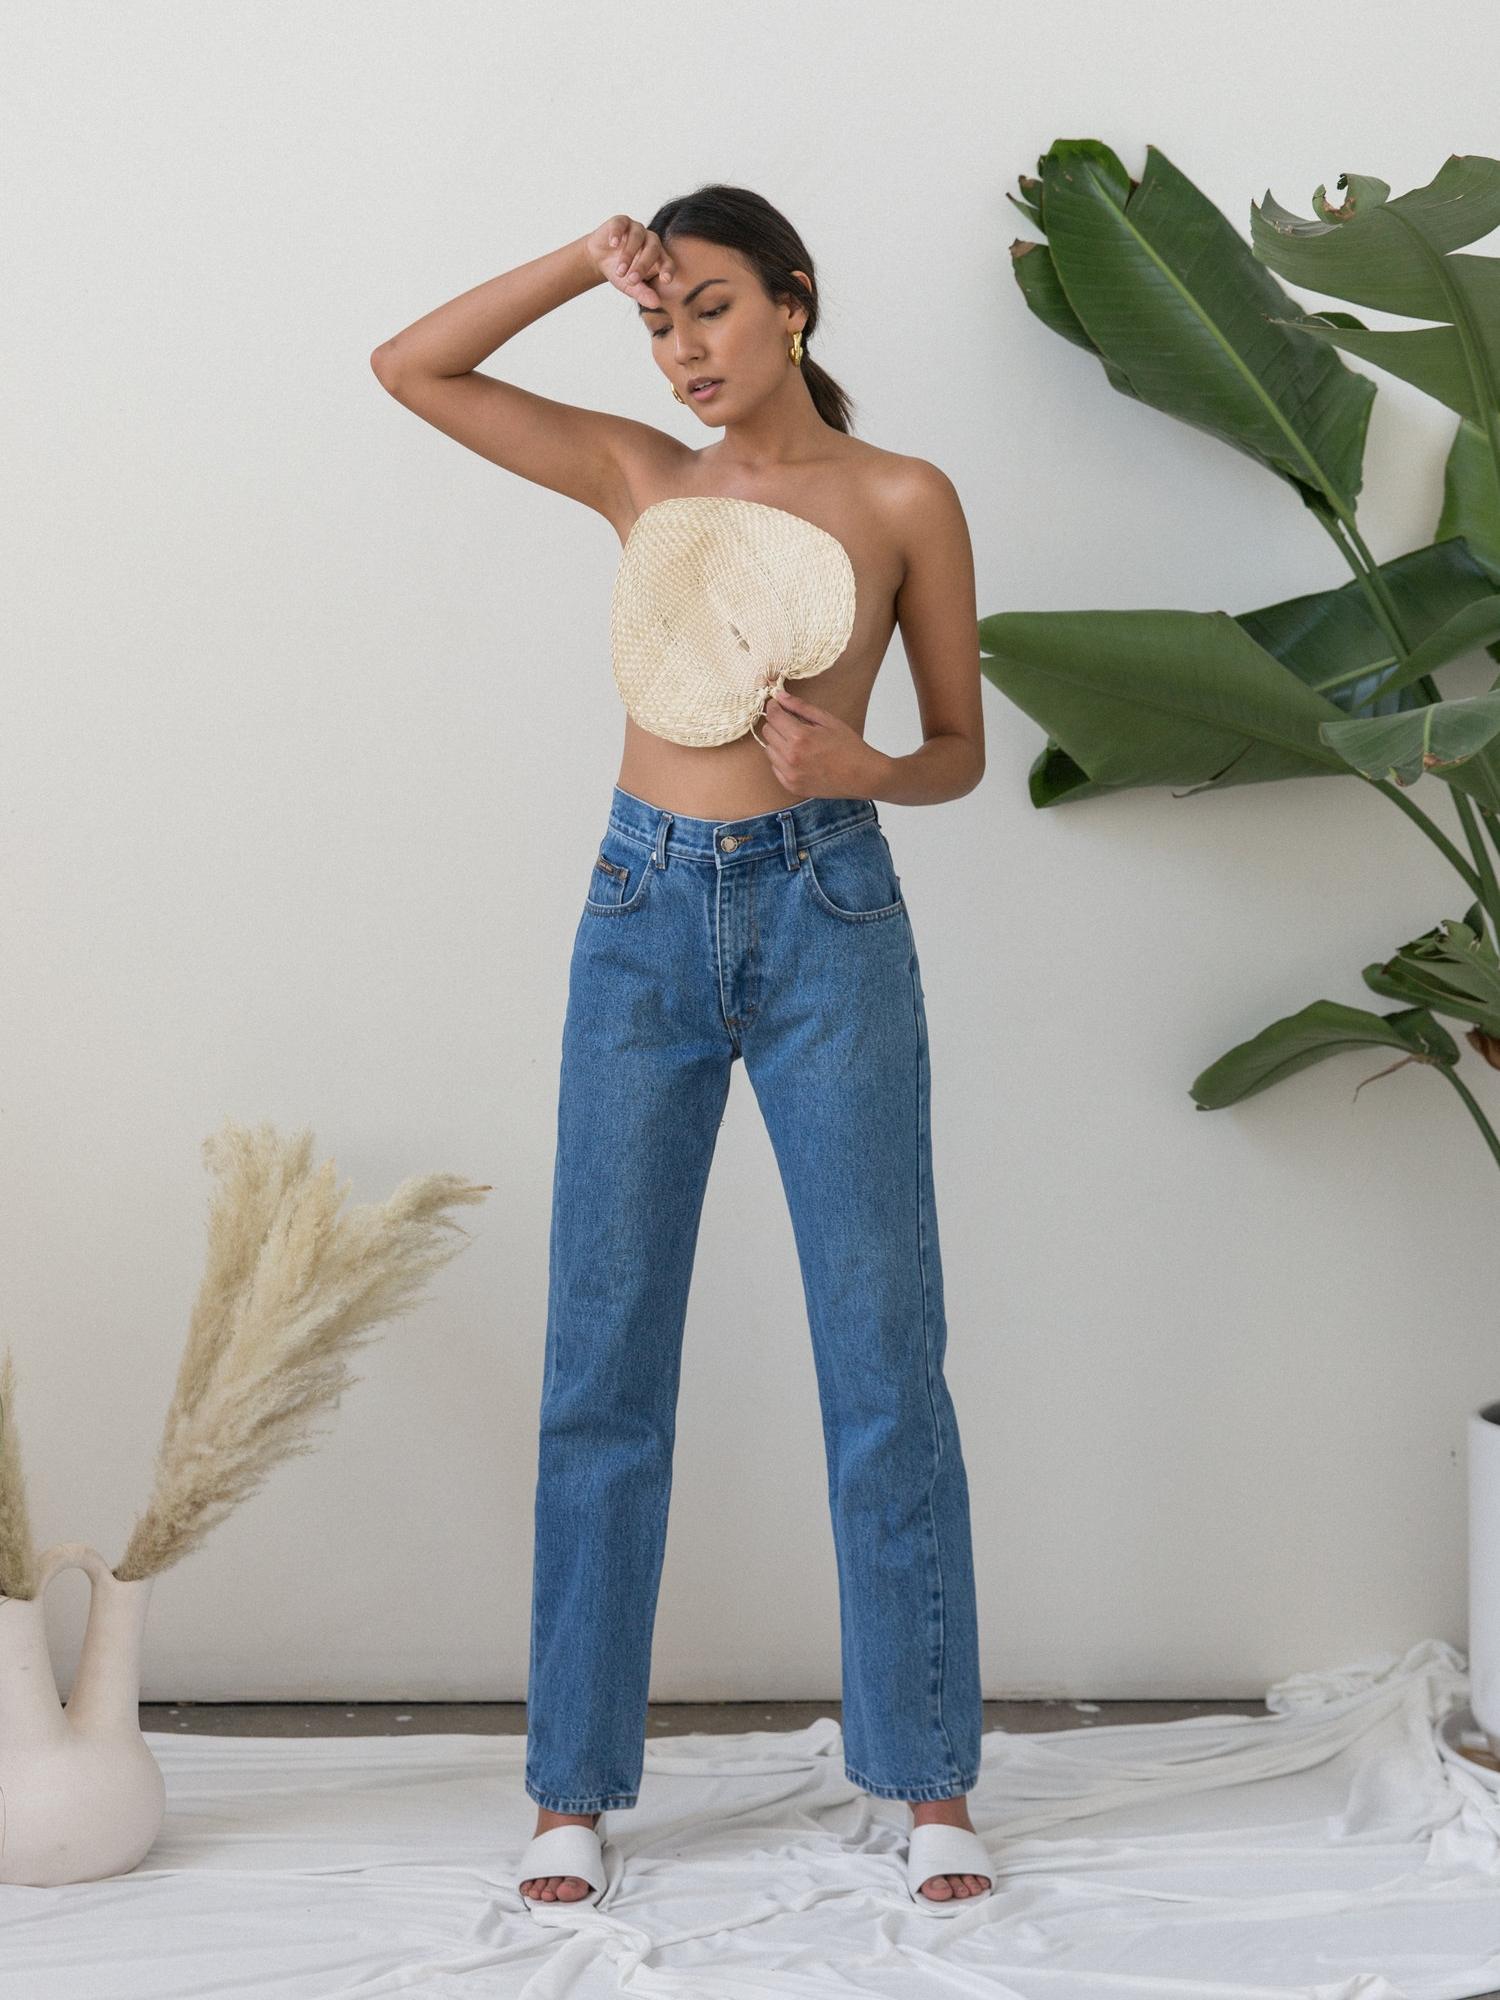 For a vintage lover   VINTAGE HUGO BOSS HIGH RISE JEANS from Shopgirl LA $52